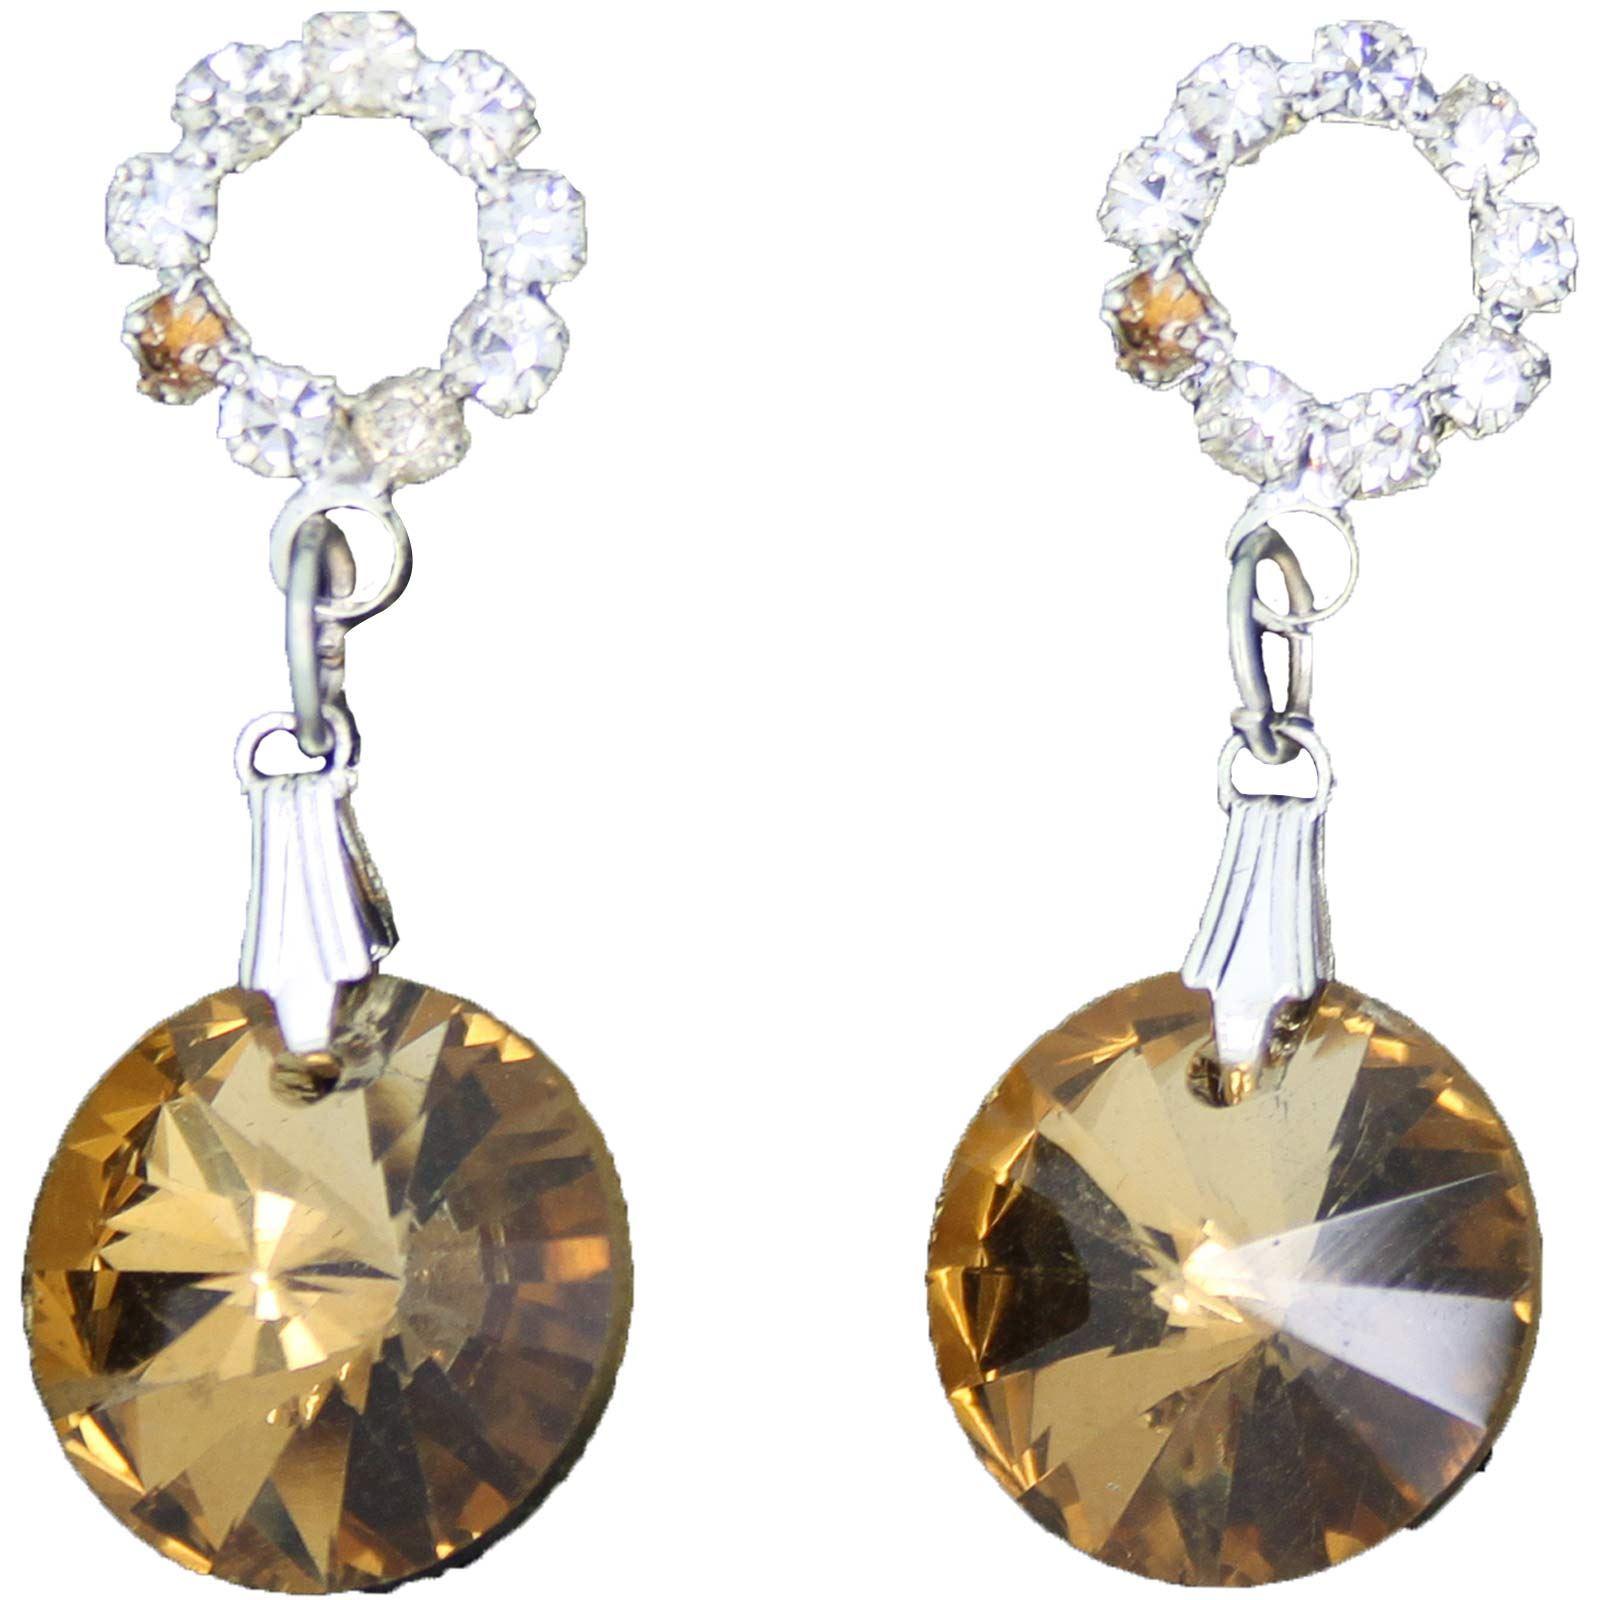 True-Face-Ladies-Women-039-s-Elegant-Earrings-Necklace-Set-Metal-Alloy-Jewellery thumbnail 9